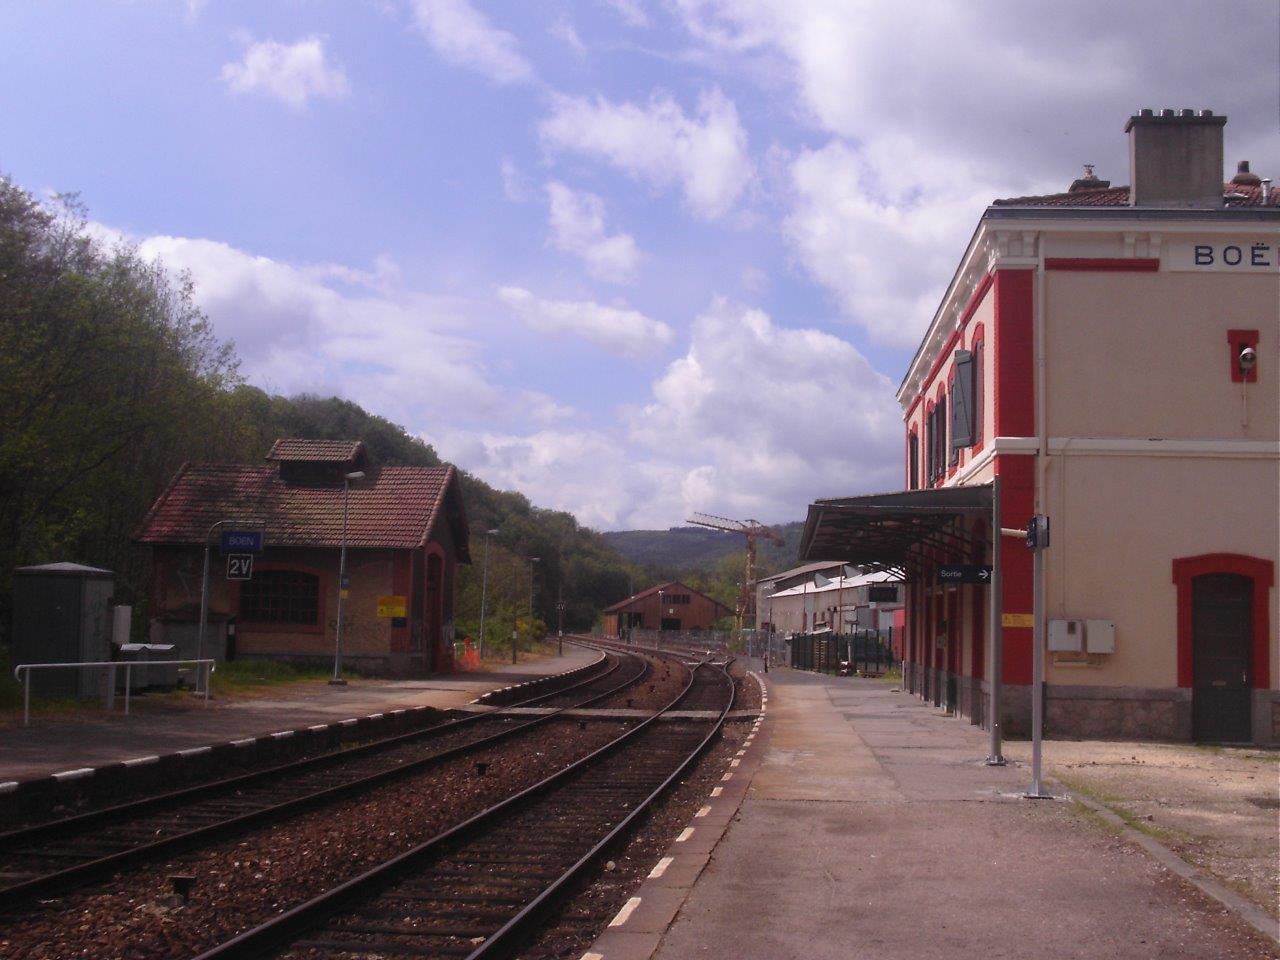 gare-de-boen-train-station